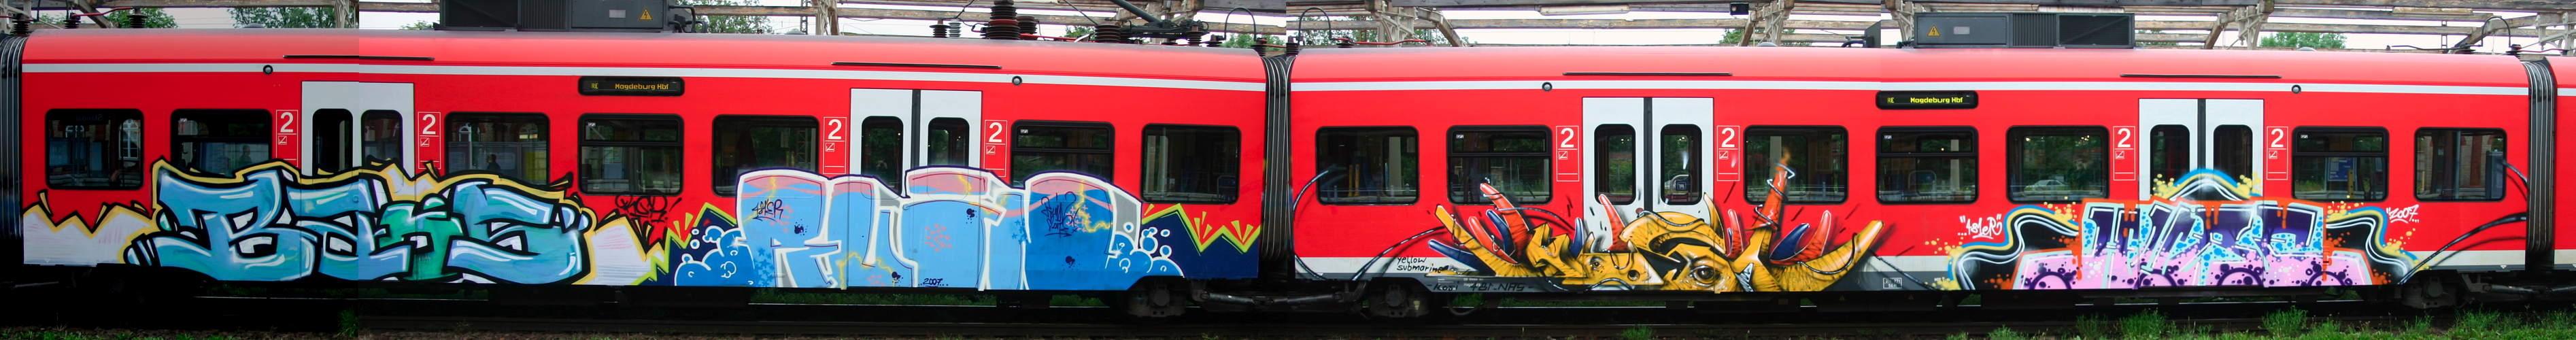 Trains 282